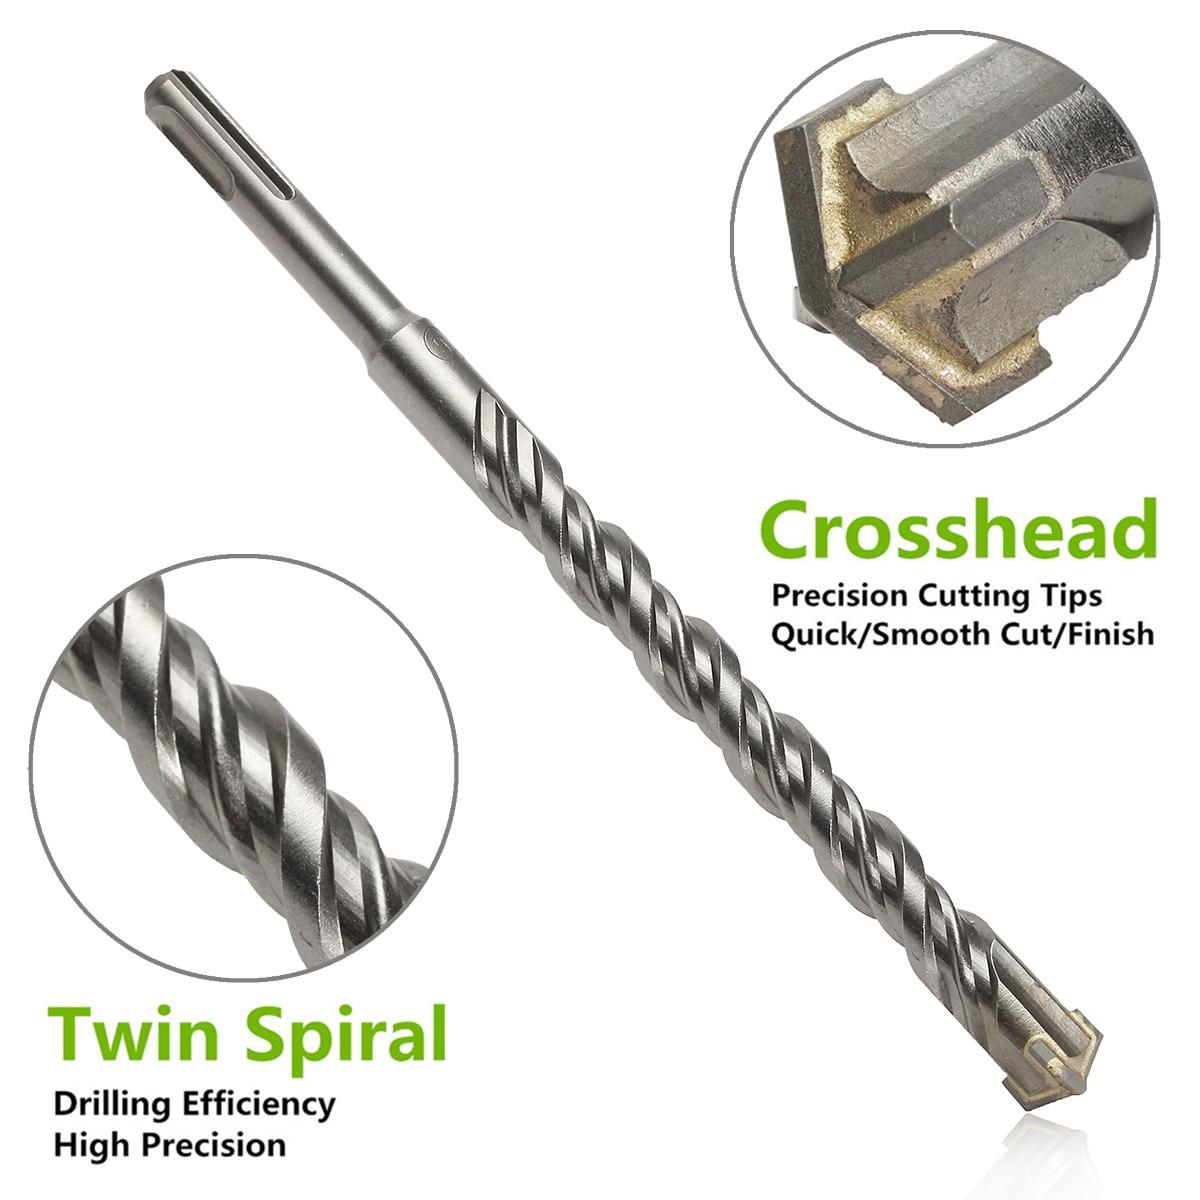 Masonry Drill Bit Tungsten Carbide Crosshead Masonry Drill Bits 5mm to 14mm